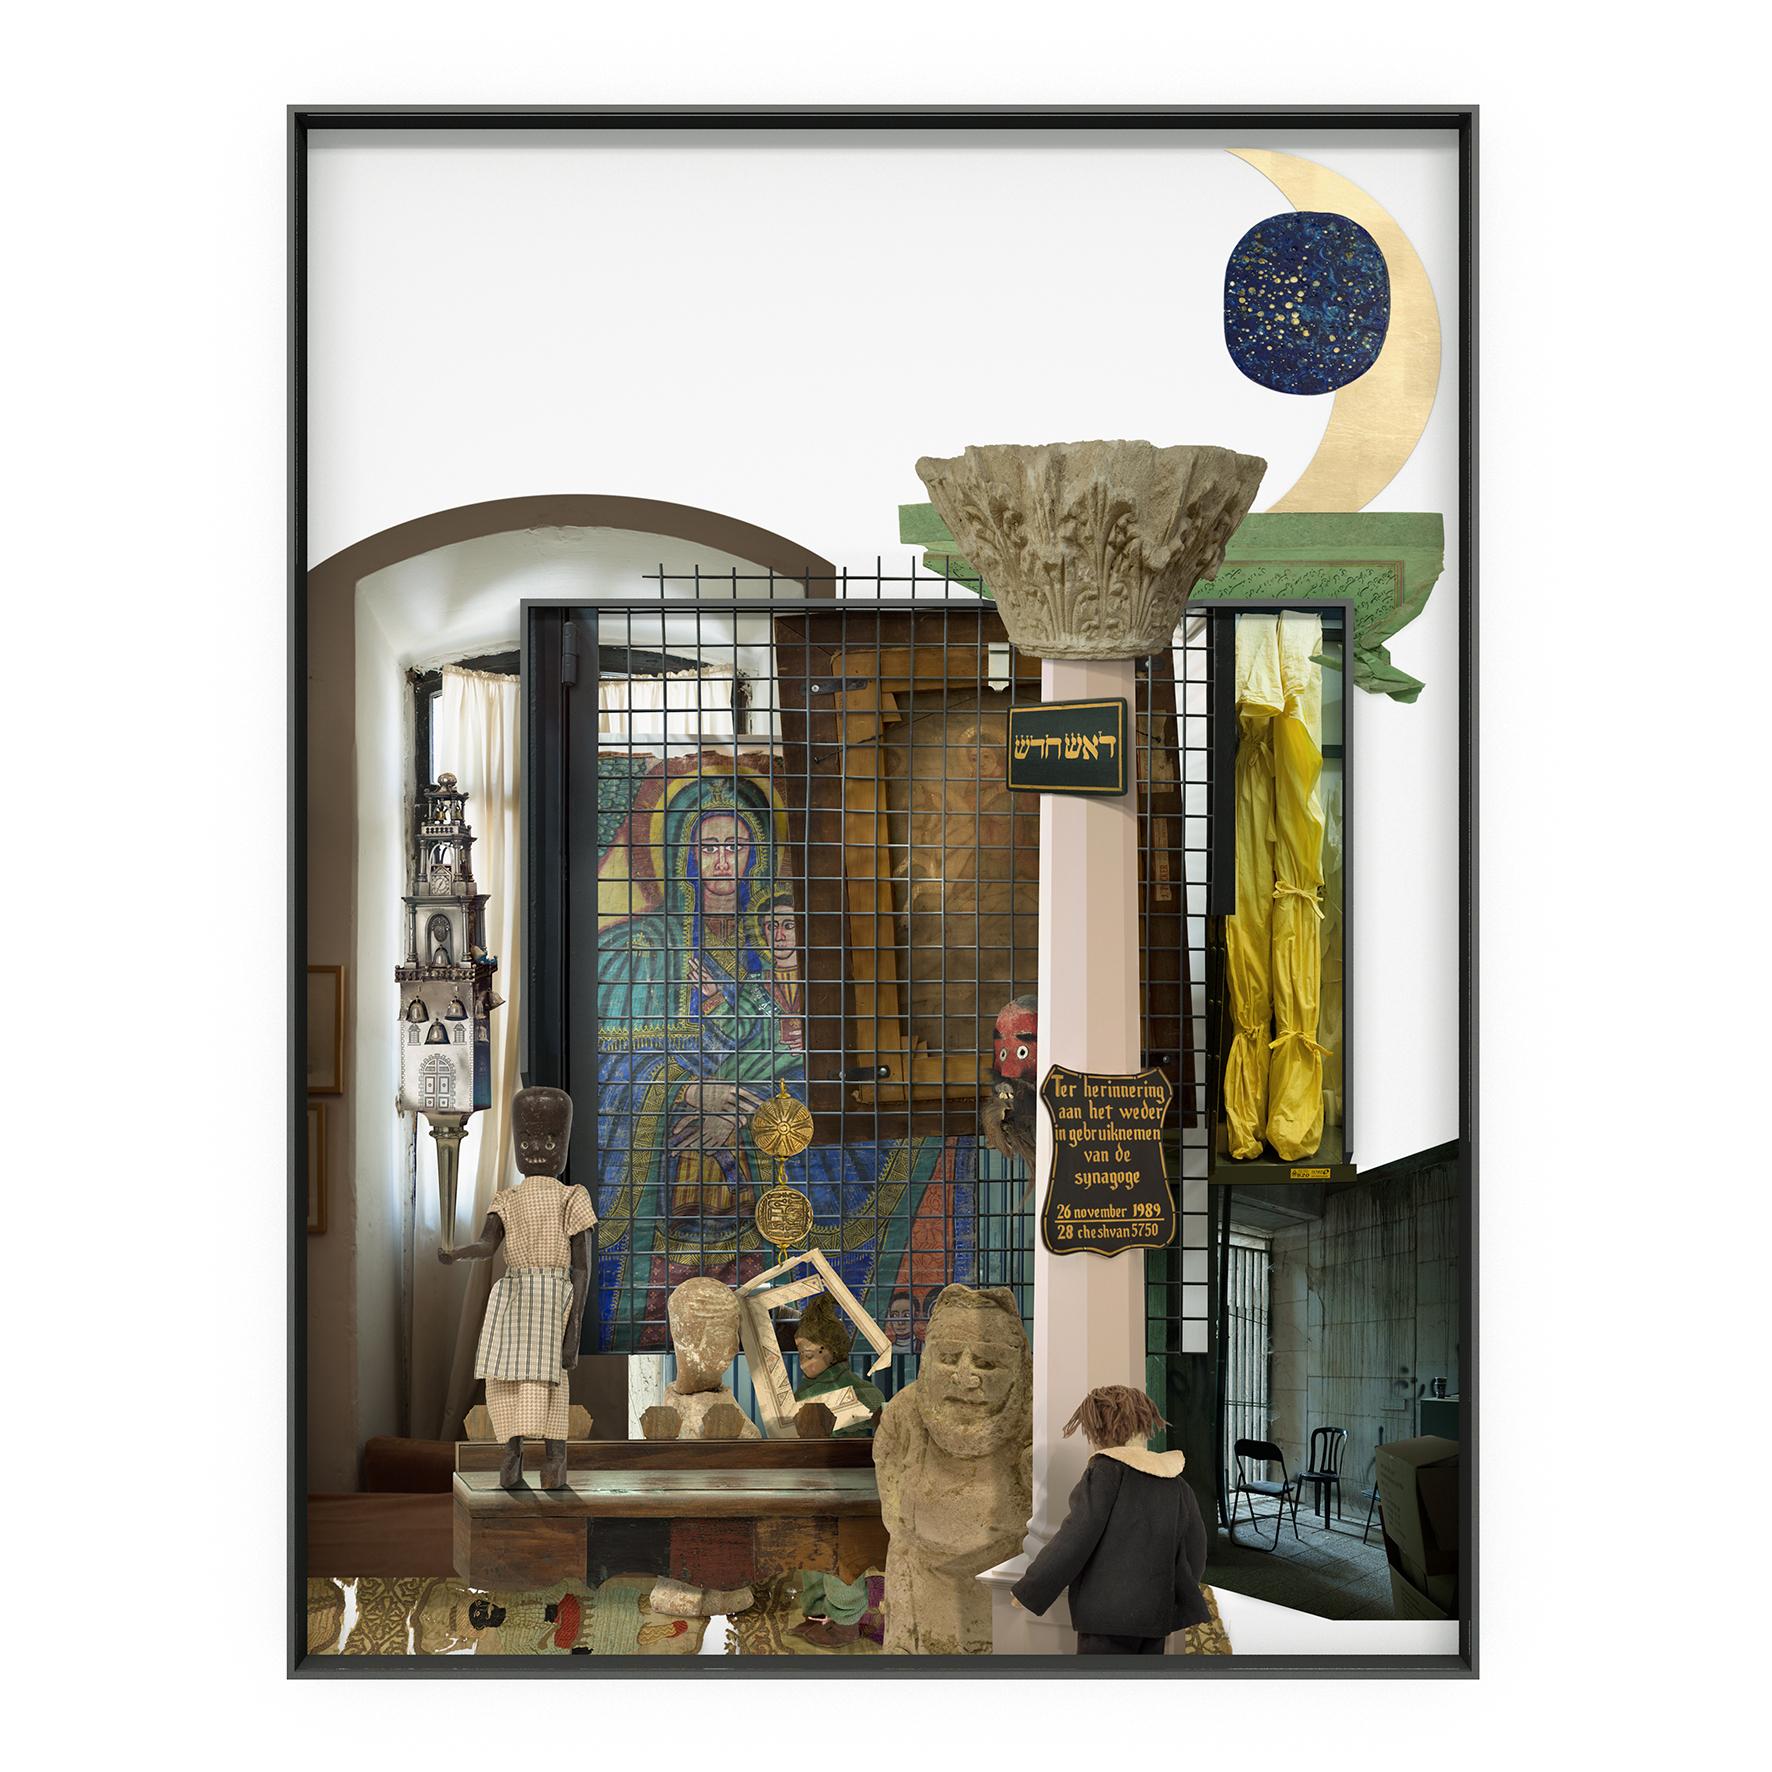 Ilit Azoulay, New Head, 2017, inkjet print, 161 x 122 cm